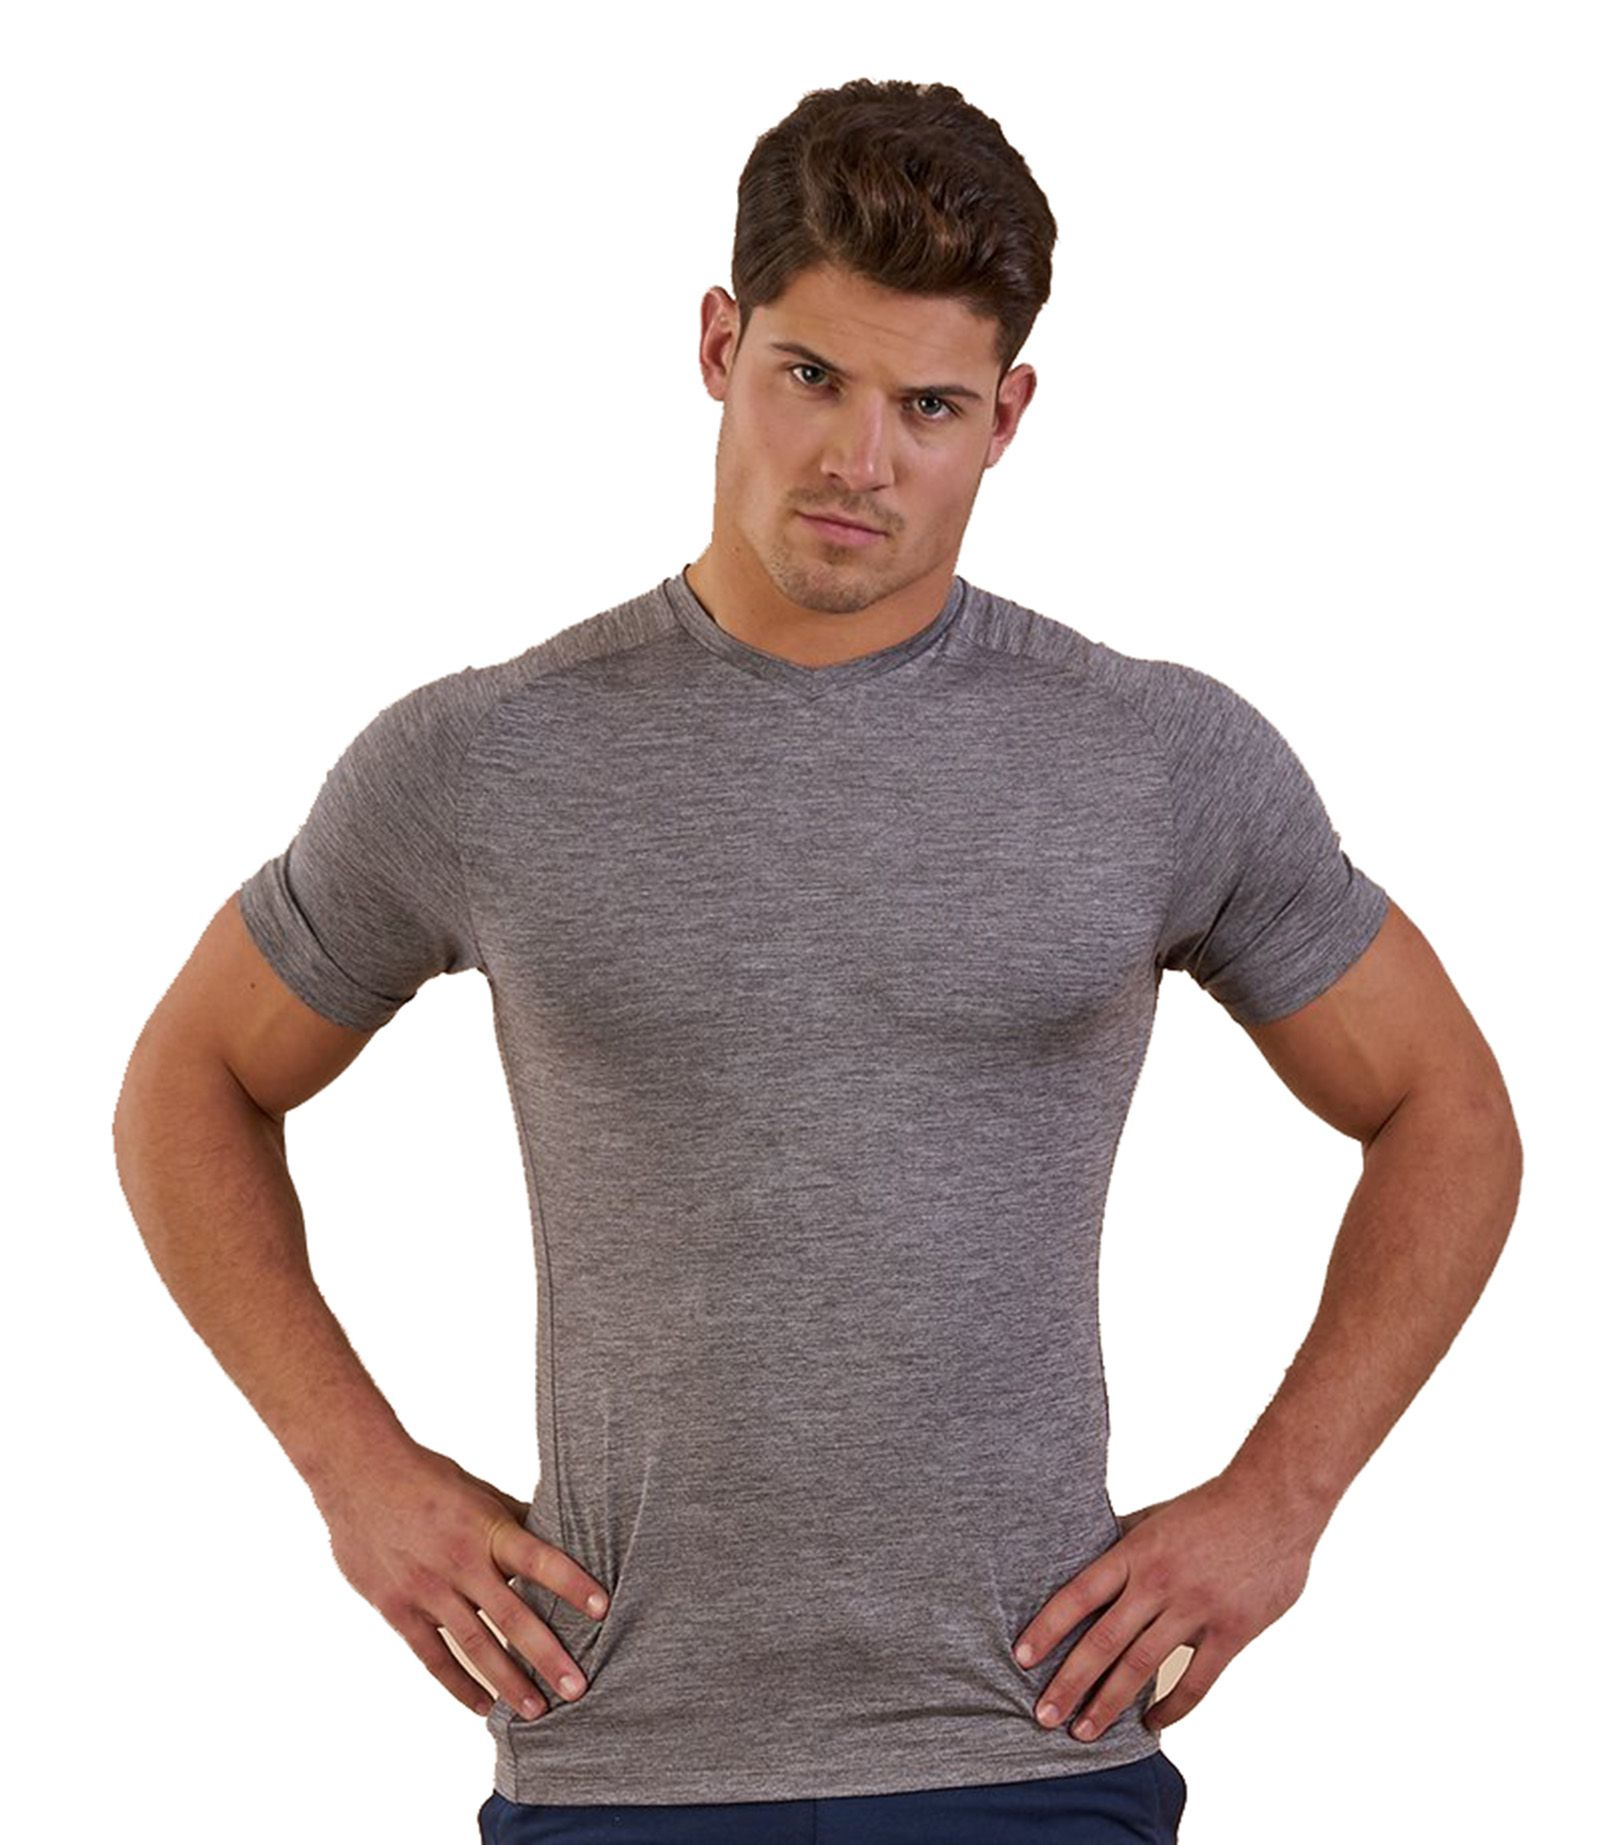 Zesteez Men Stretchable Premium Quality Light Weight Moisture Wiking Tshirt